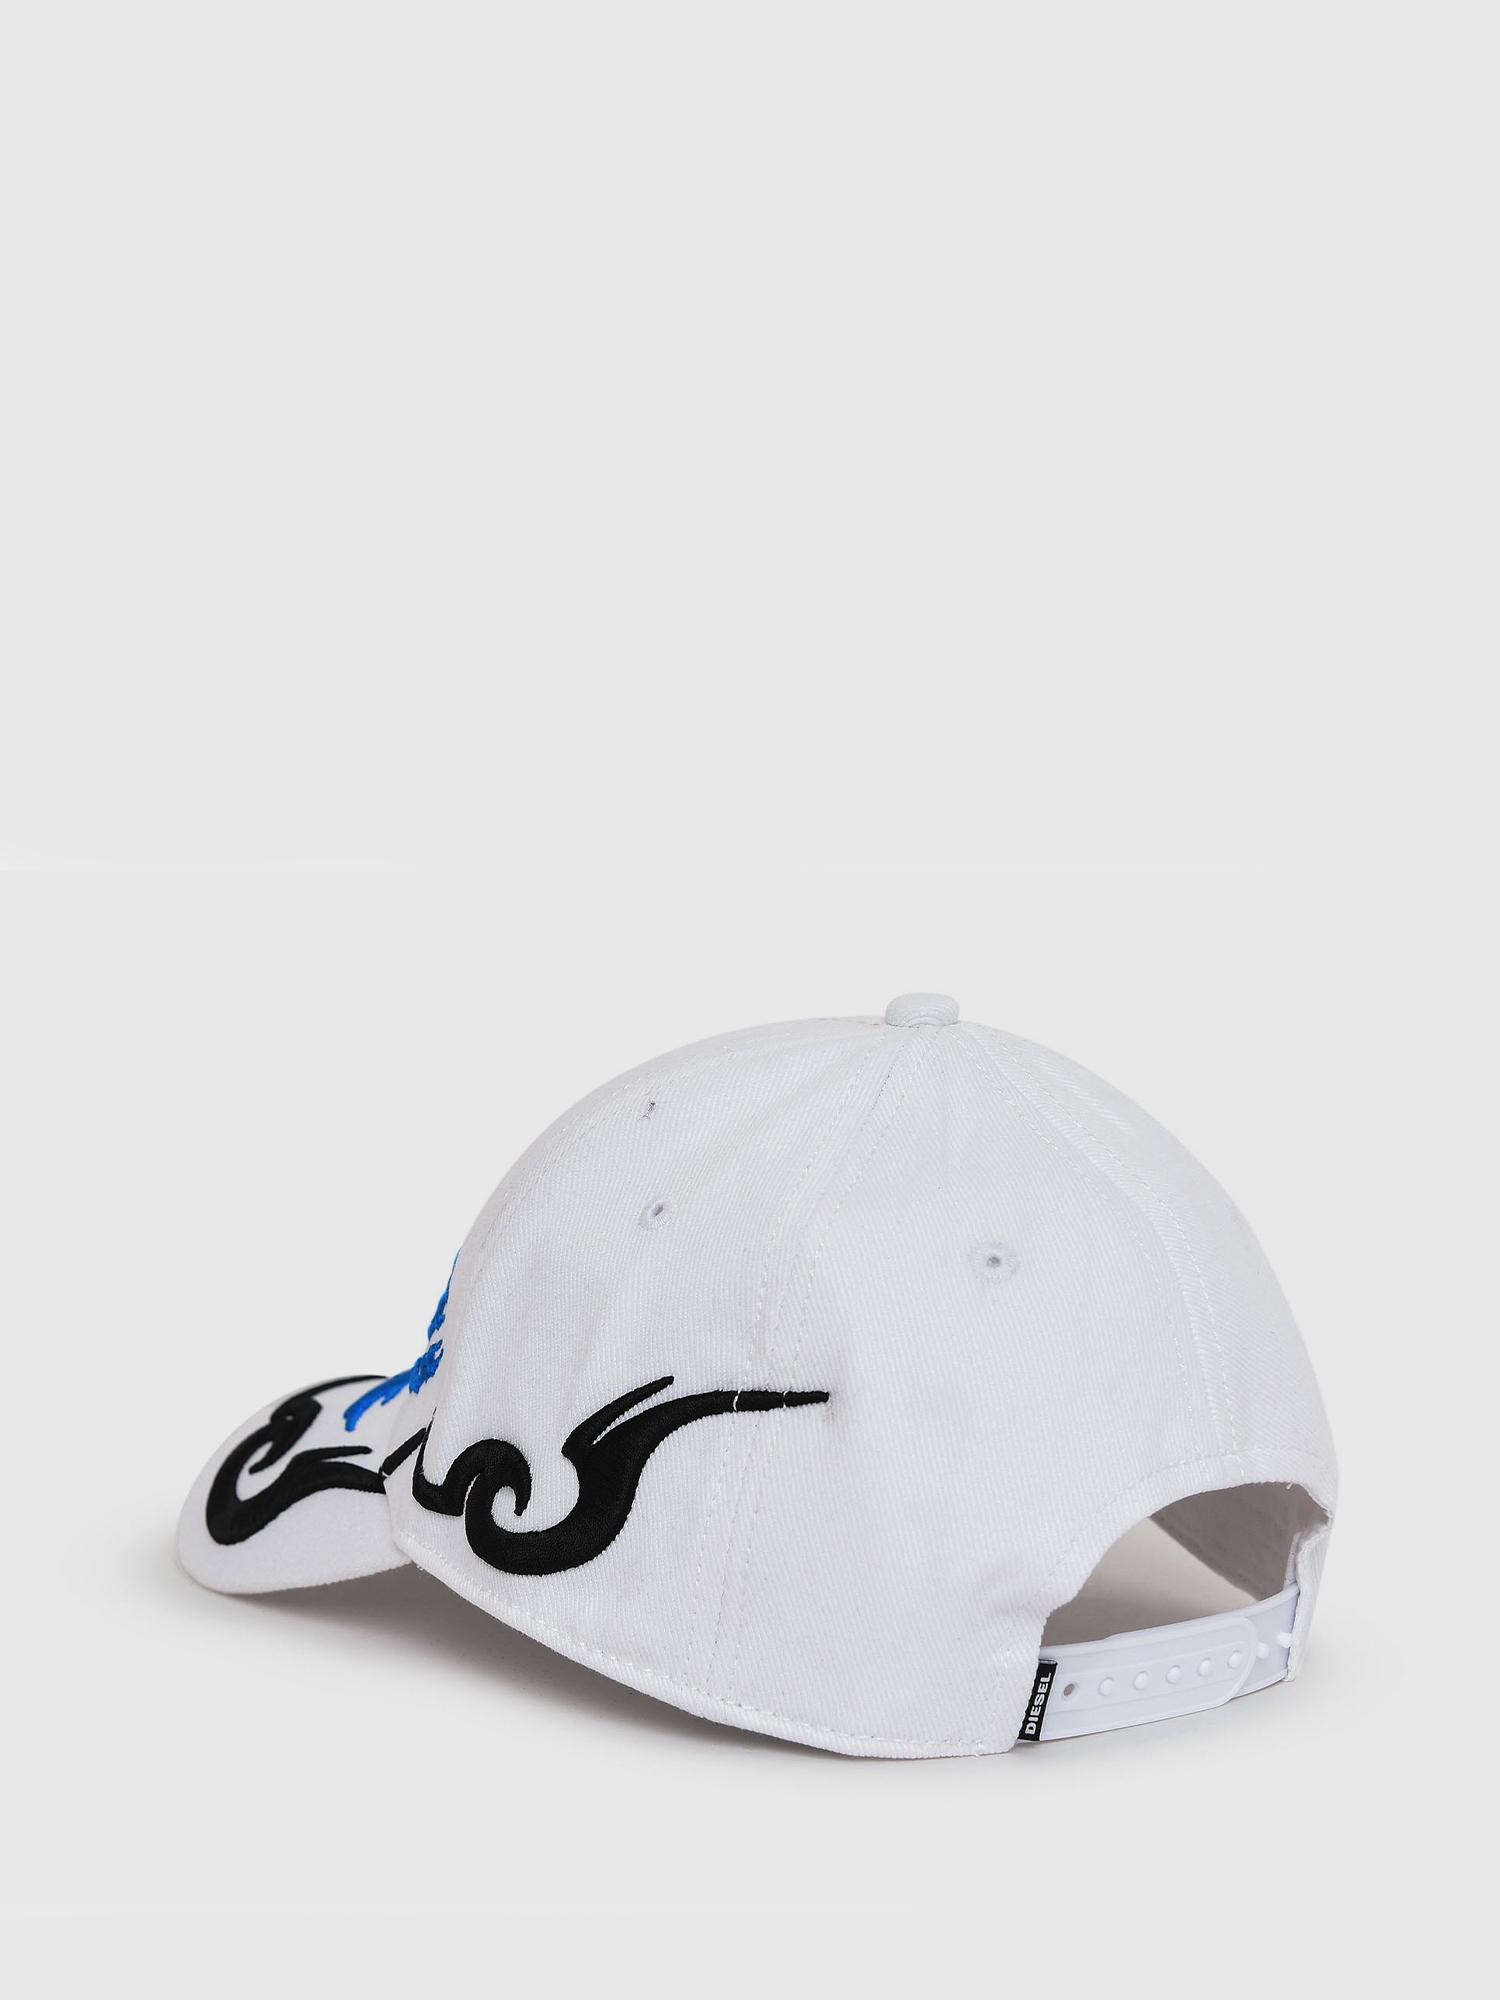 Diesel - DRIBALE, White - Caps - Image 2